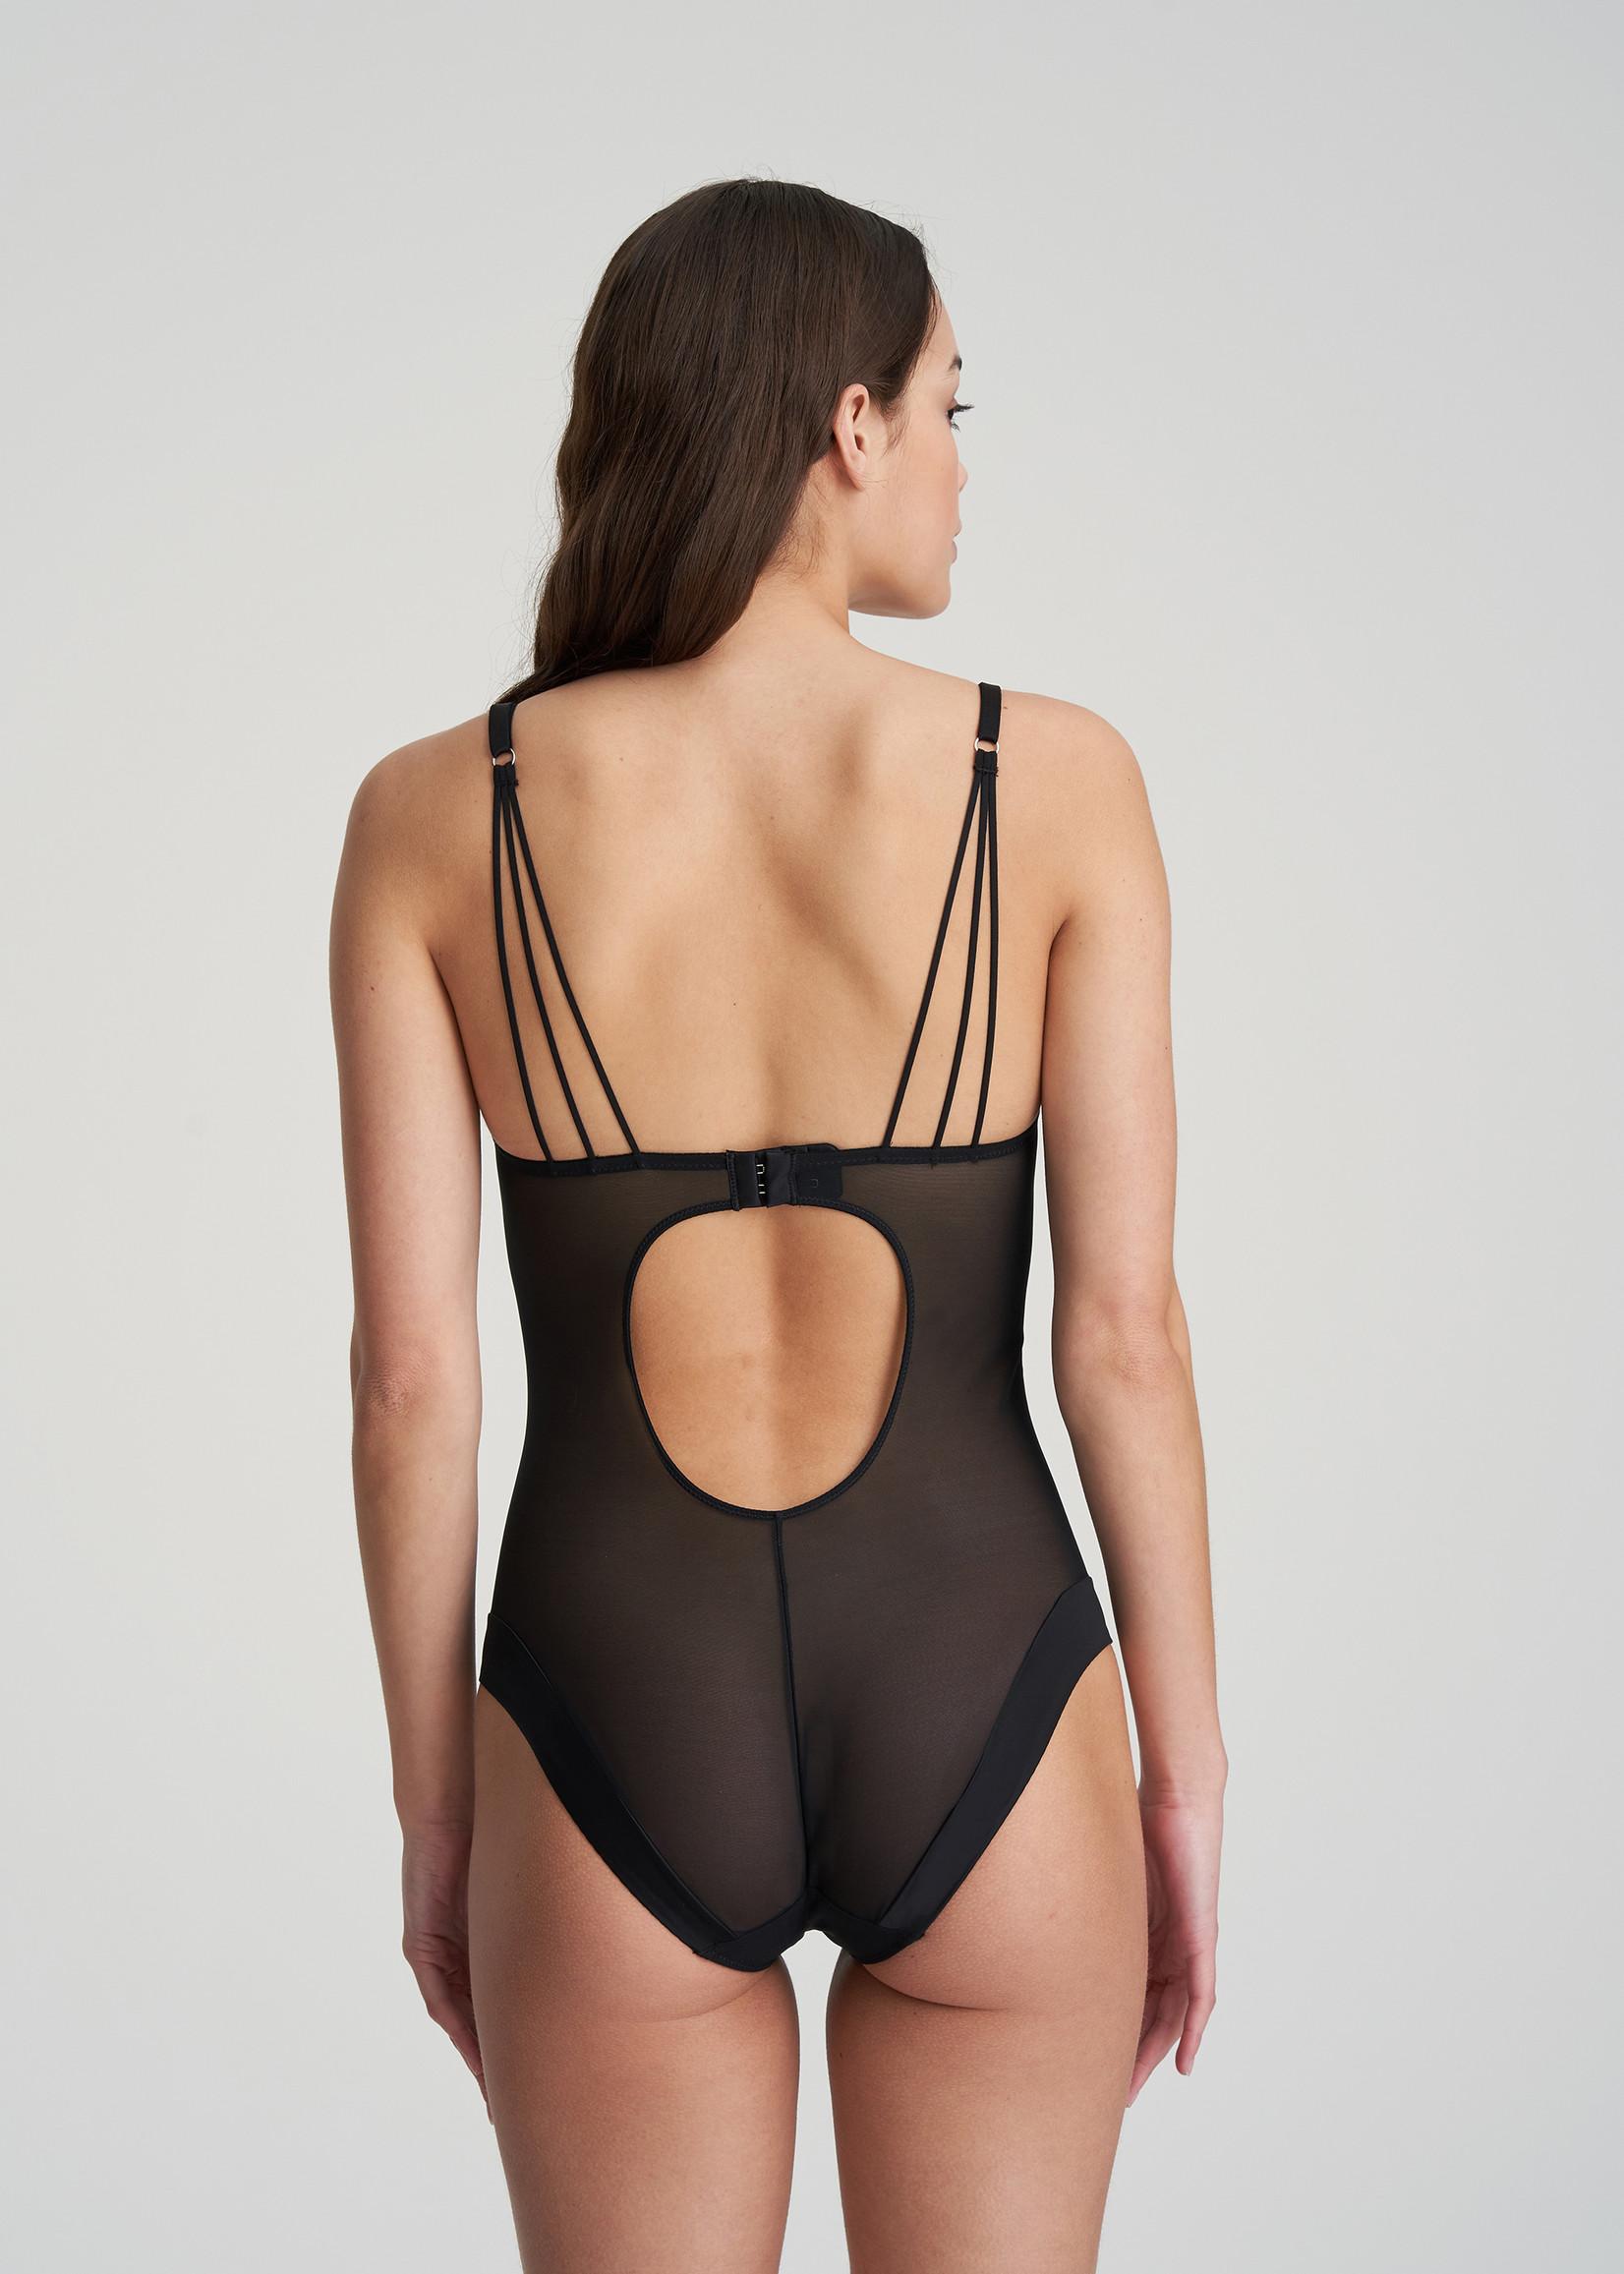 Marie Jo Gloria Bodysuit